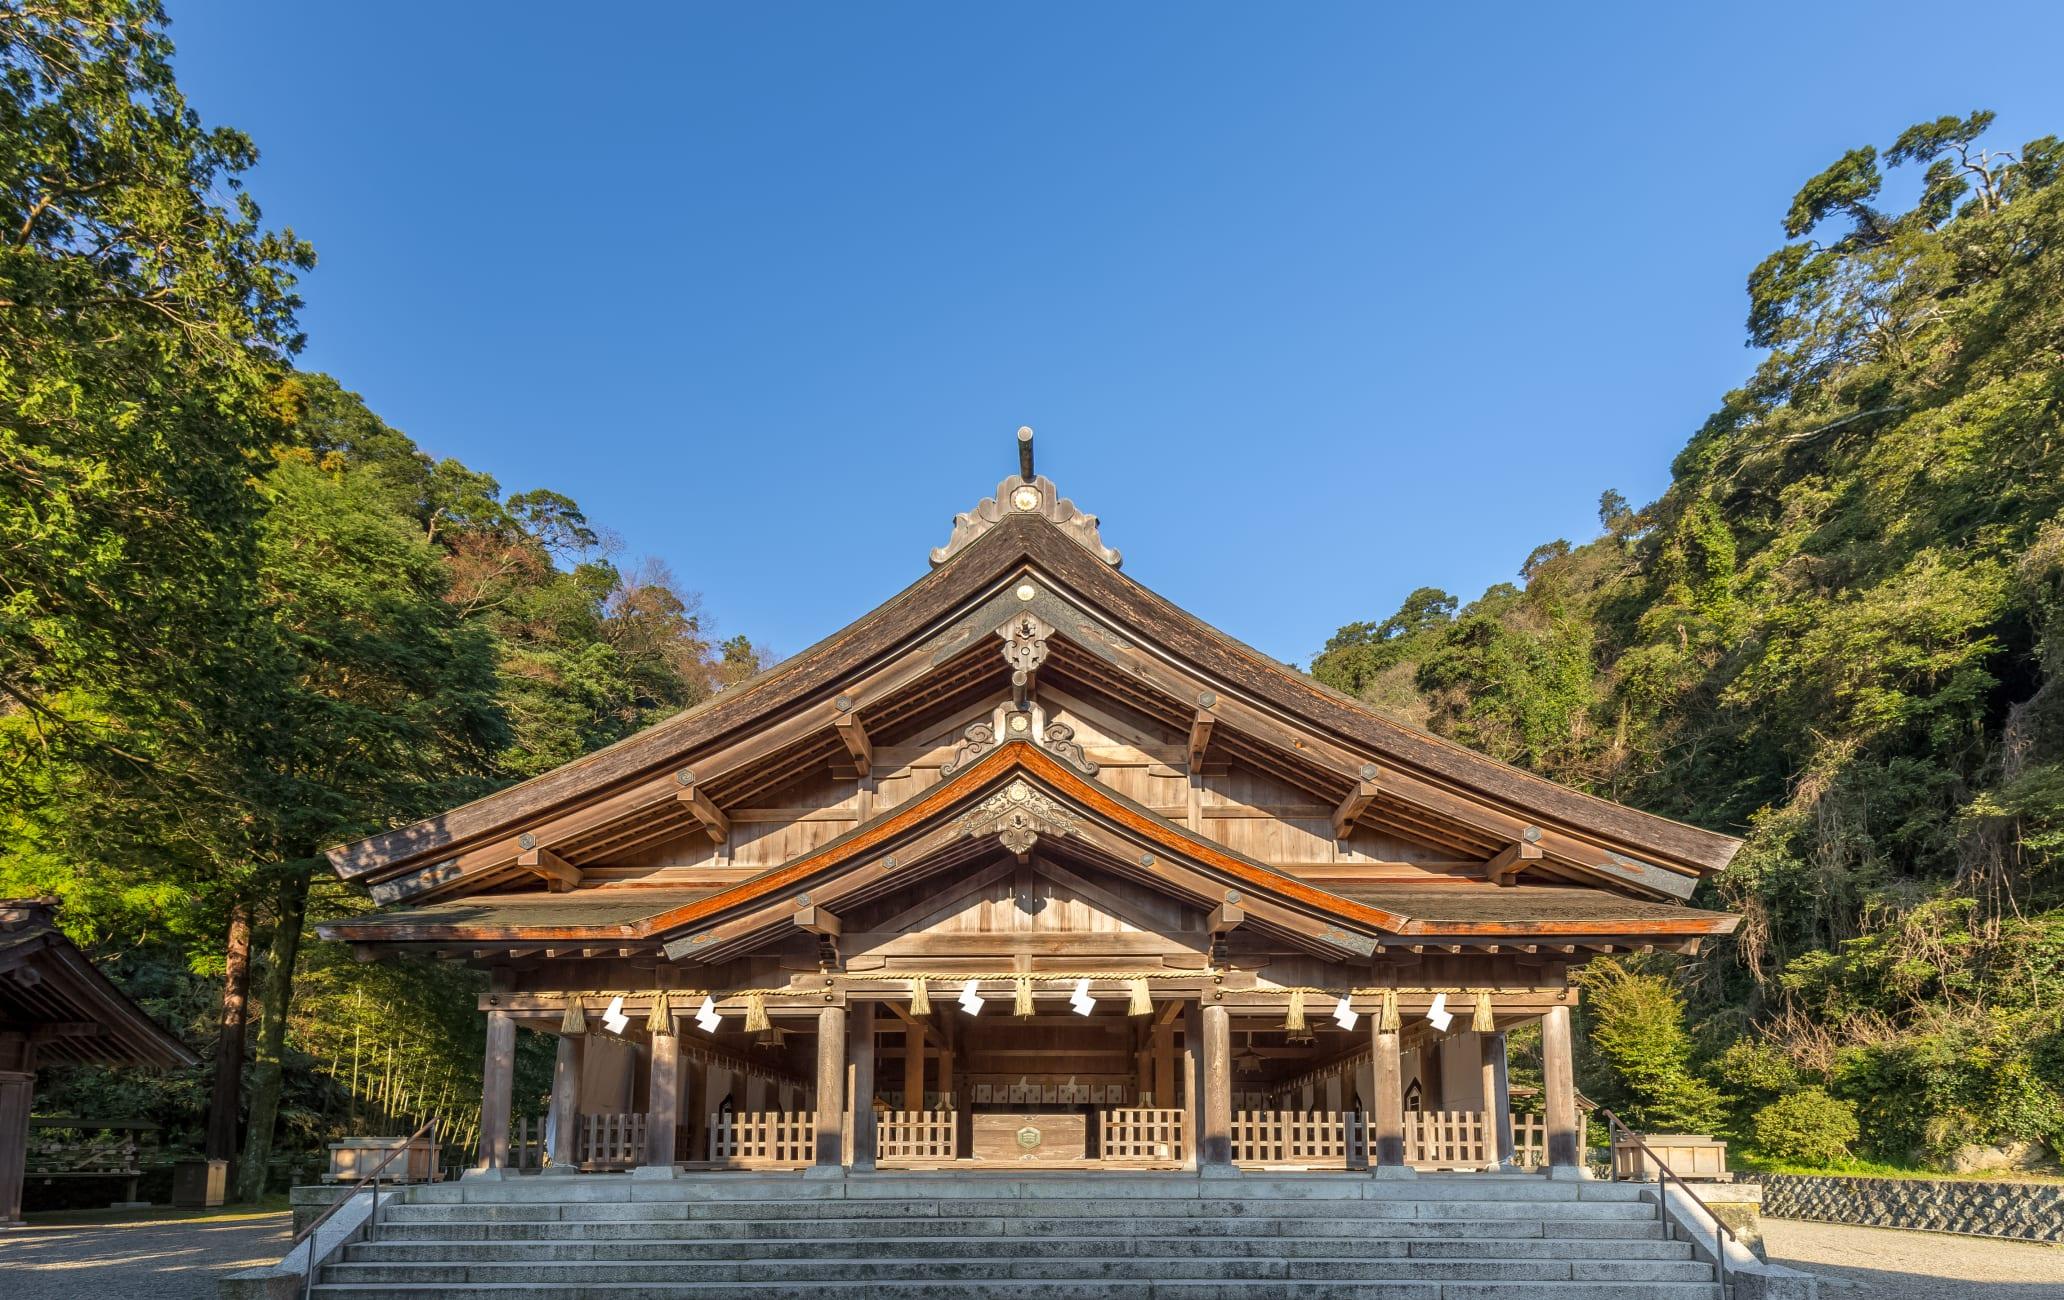 Miho-jinja Shrine